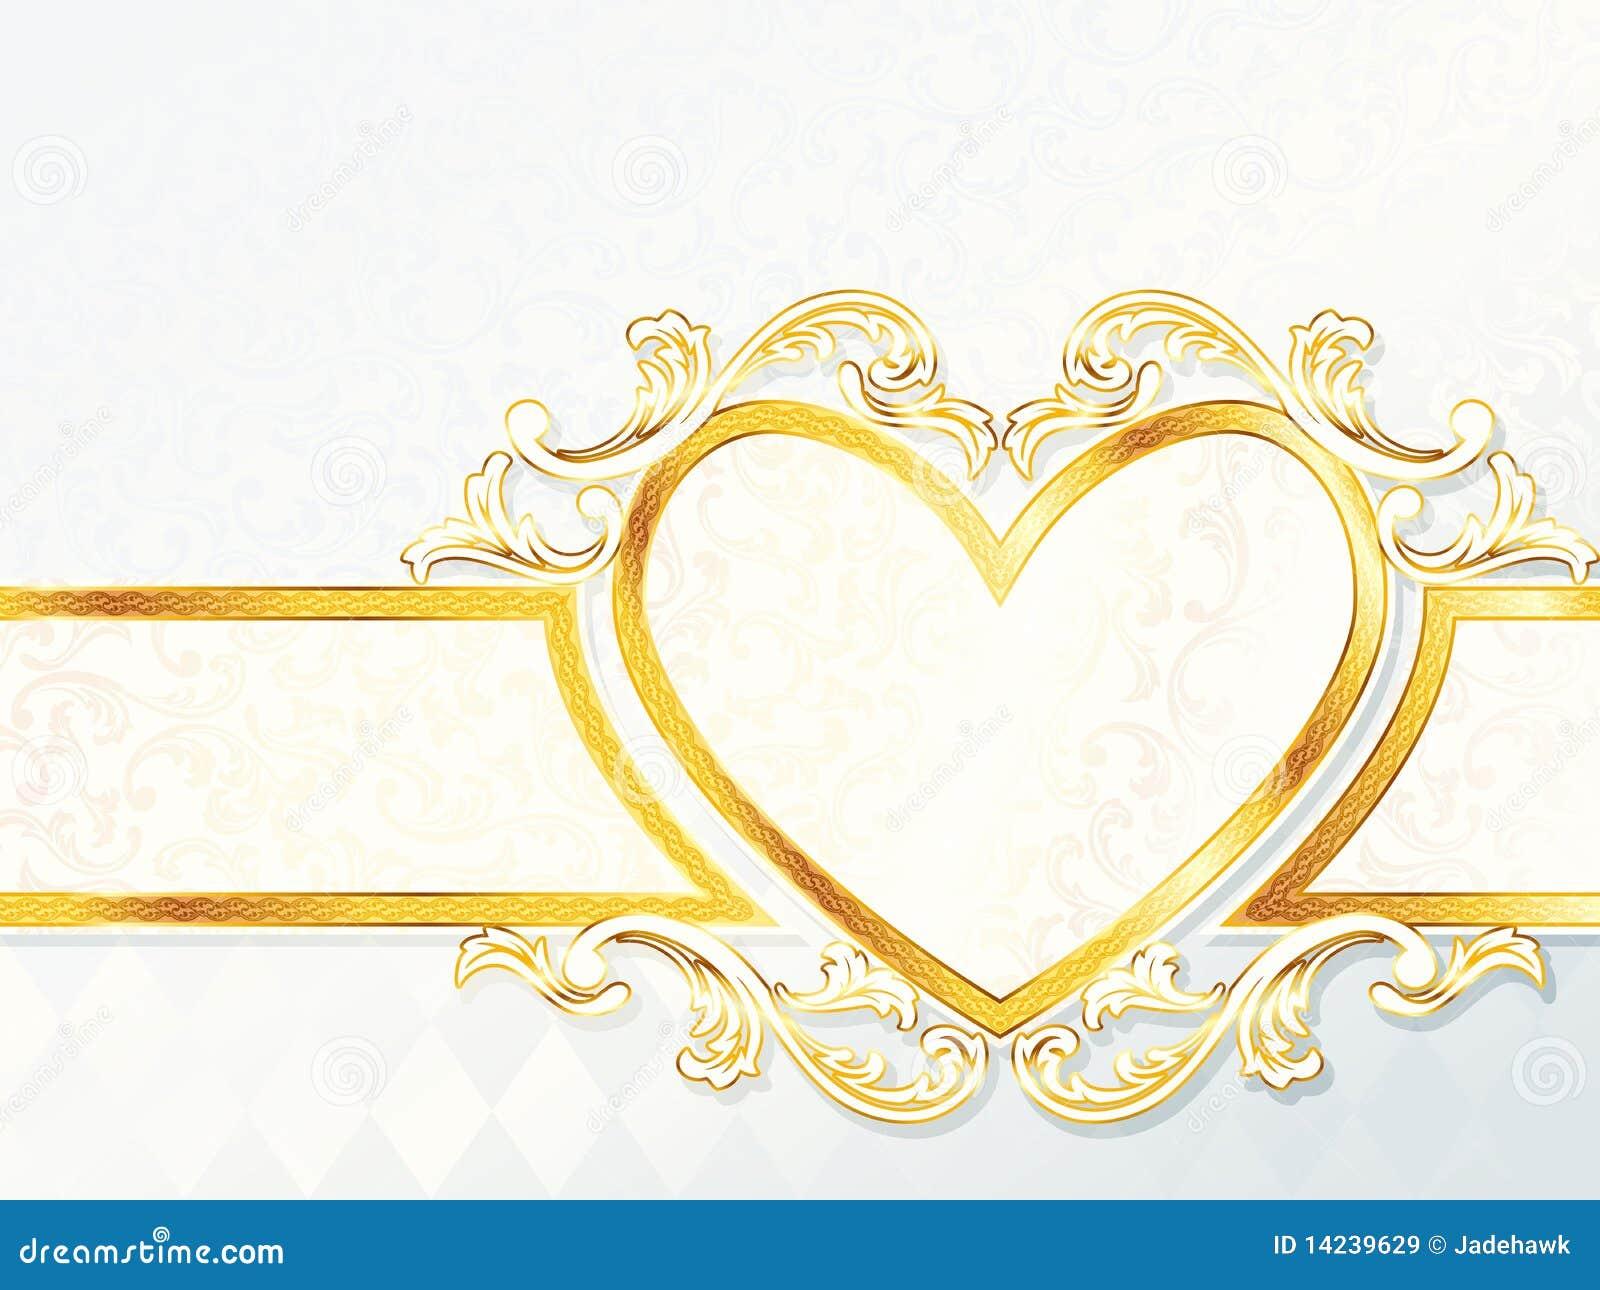 Wedding Banner Clipart